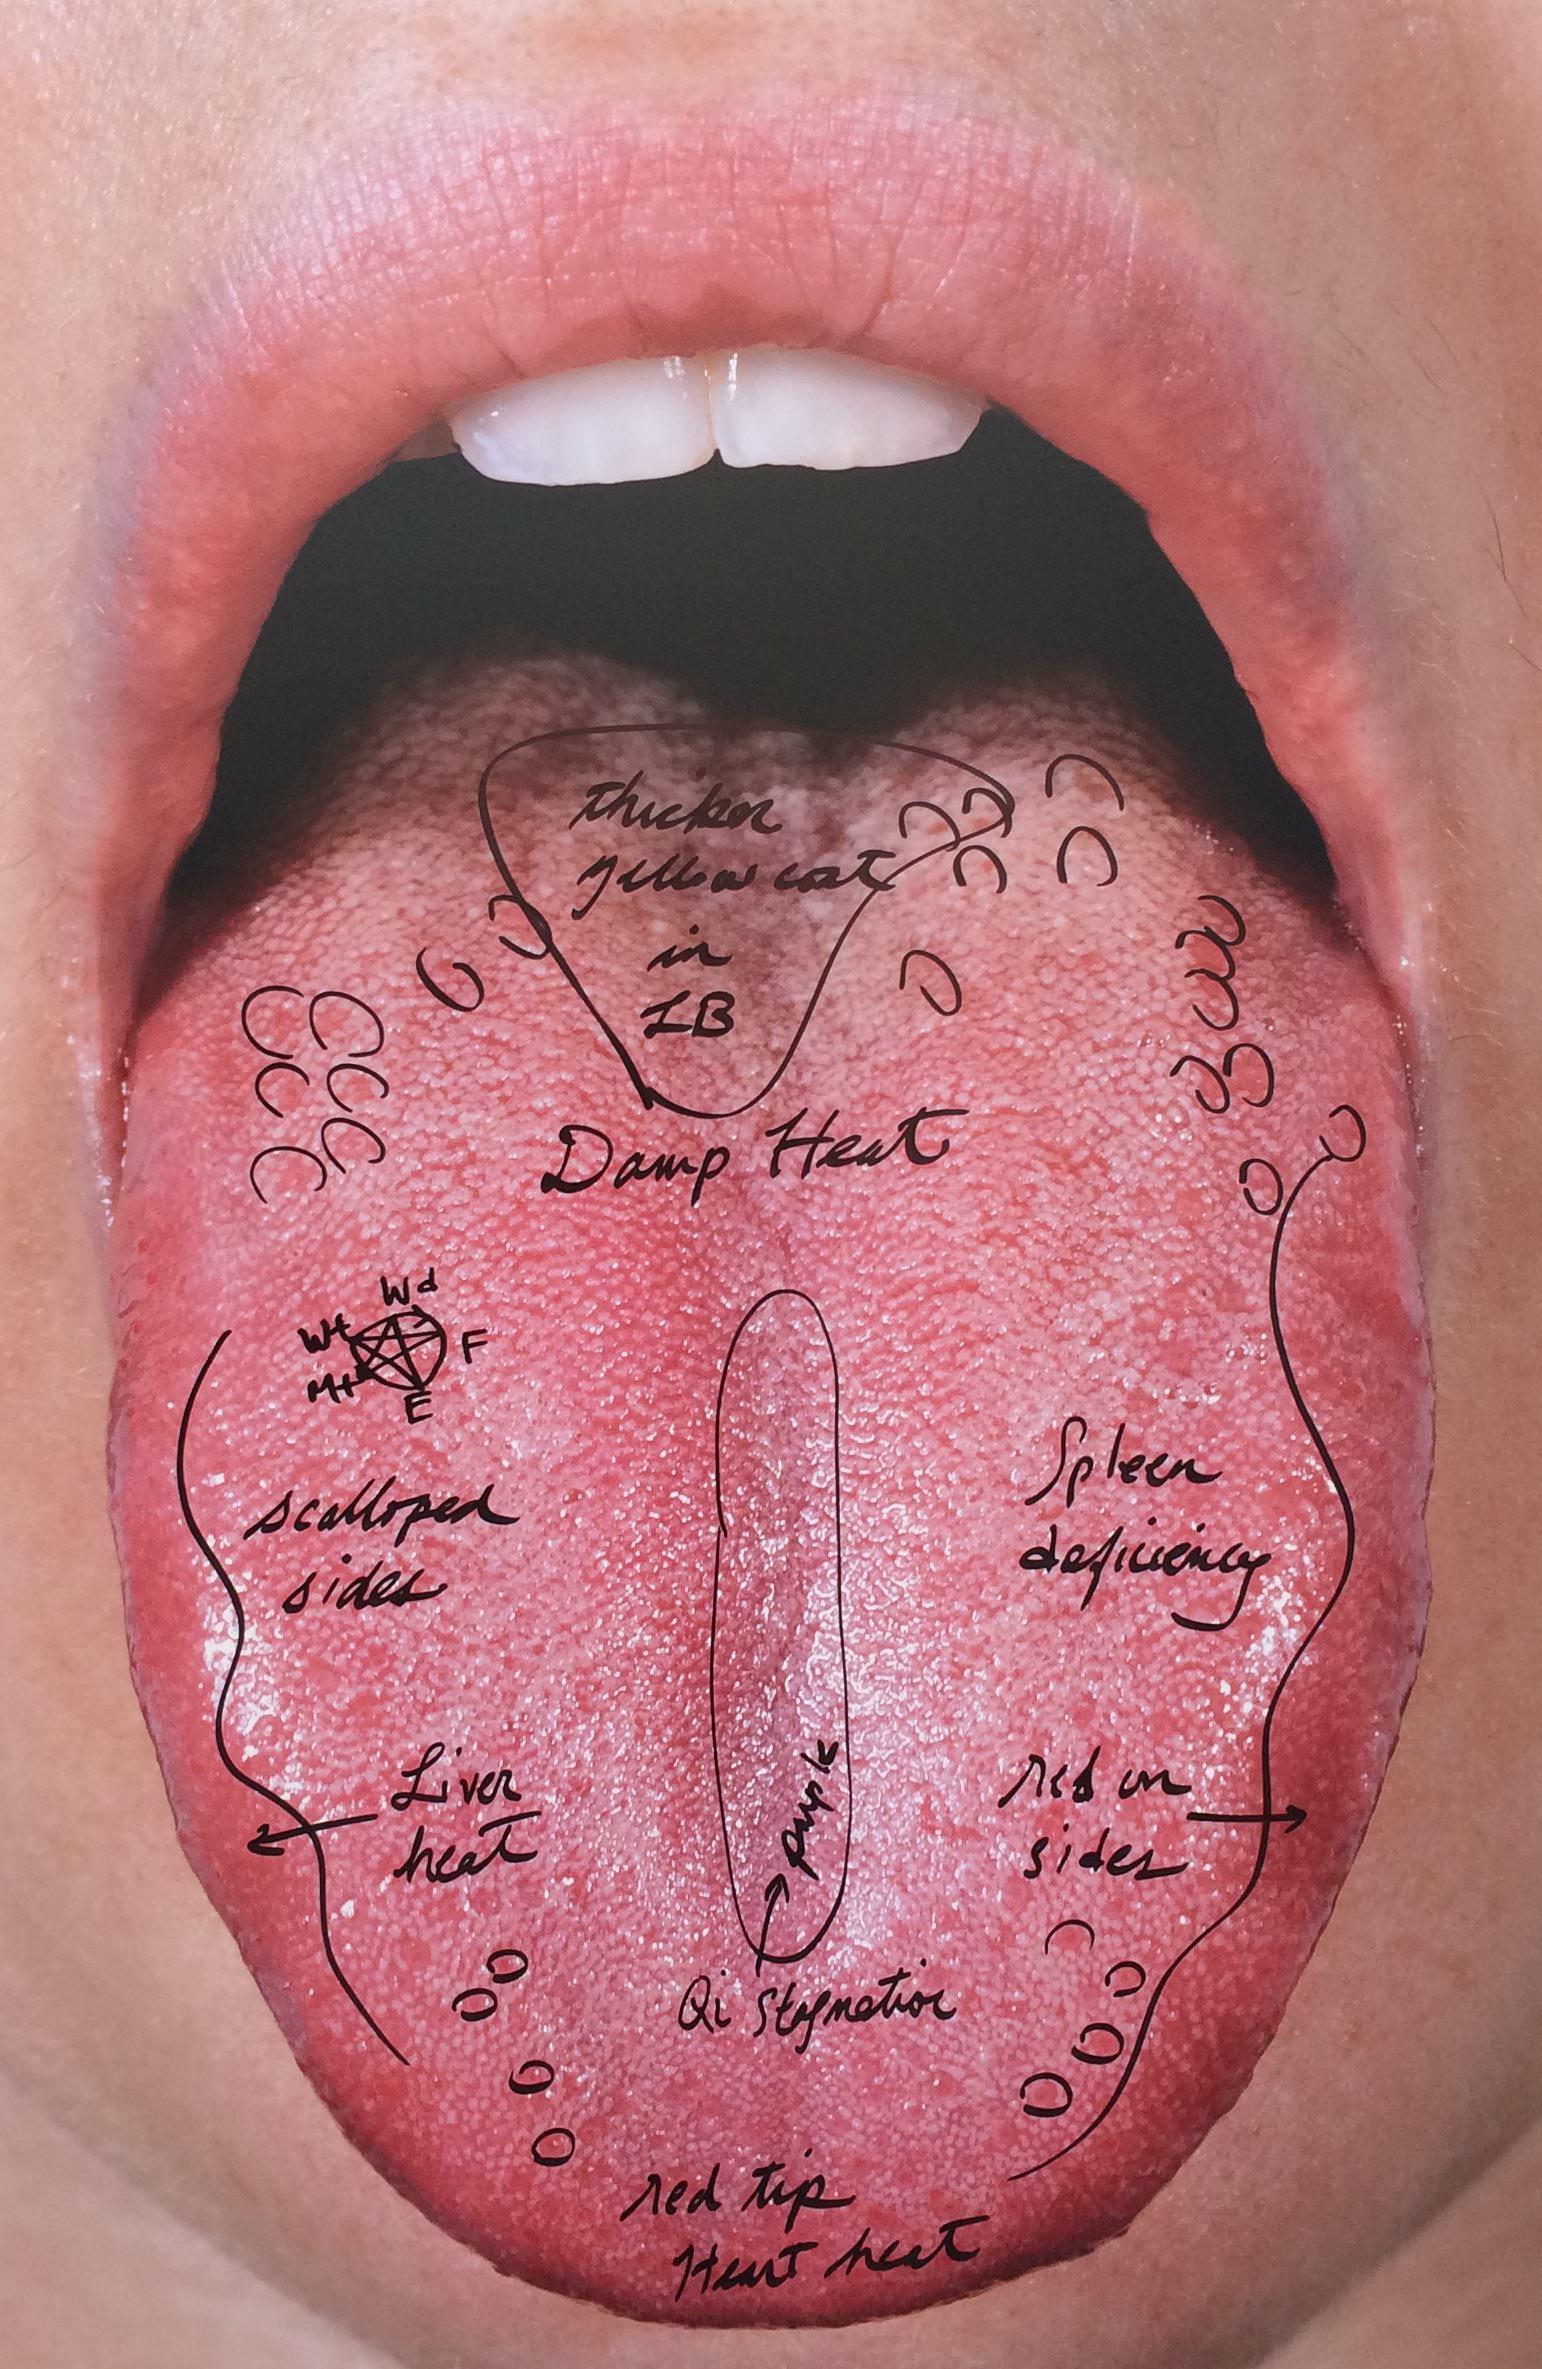 Carissa Rodriguez,It's Symptomatic / What Would Edith Say, (2015), Digital C-print on aluminium, 152,4 x 101,6 cm.Galerie Karma International.